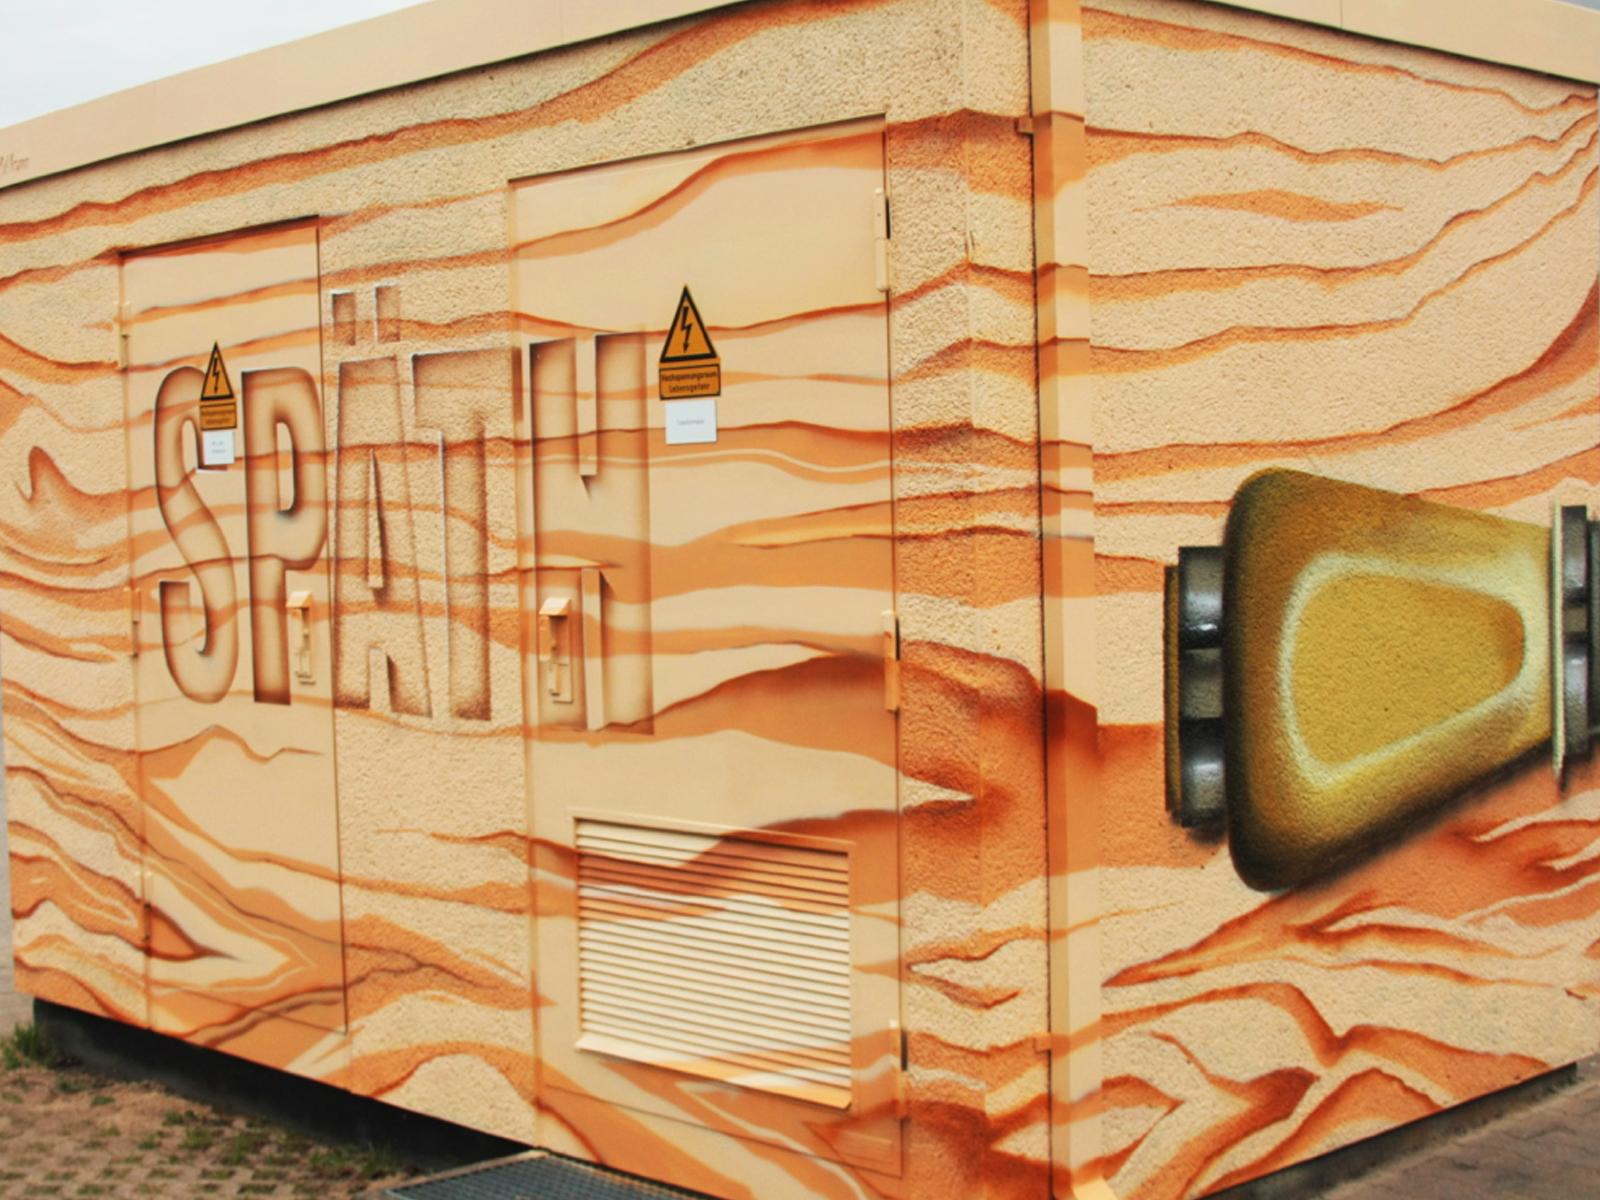 illusion,anamorph,photorealistisch,graffiti,Wandgestaltung,Kraftwerksschule,essen,düsseldorf,2014,graffiti,fassadengestaltung,graffitikuenstler,graffitiagentur,graffiti studio,berlin